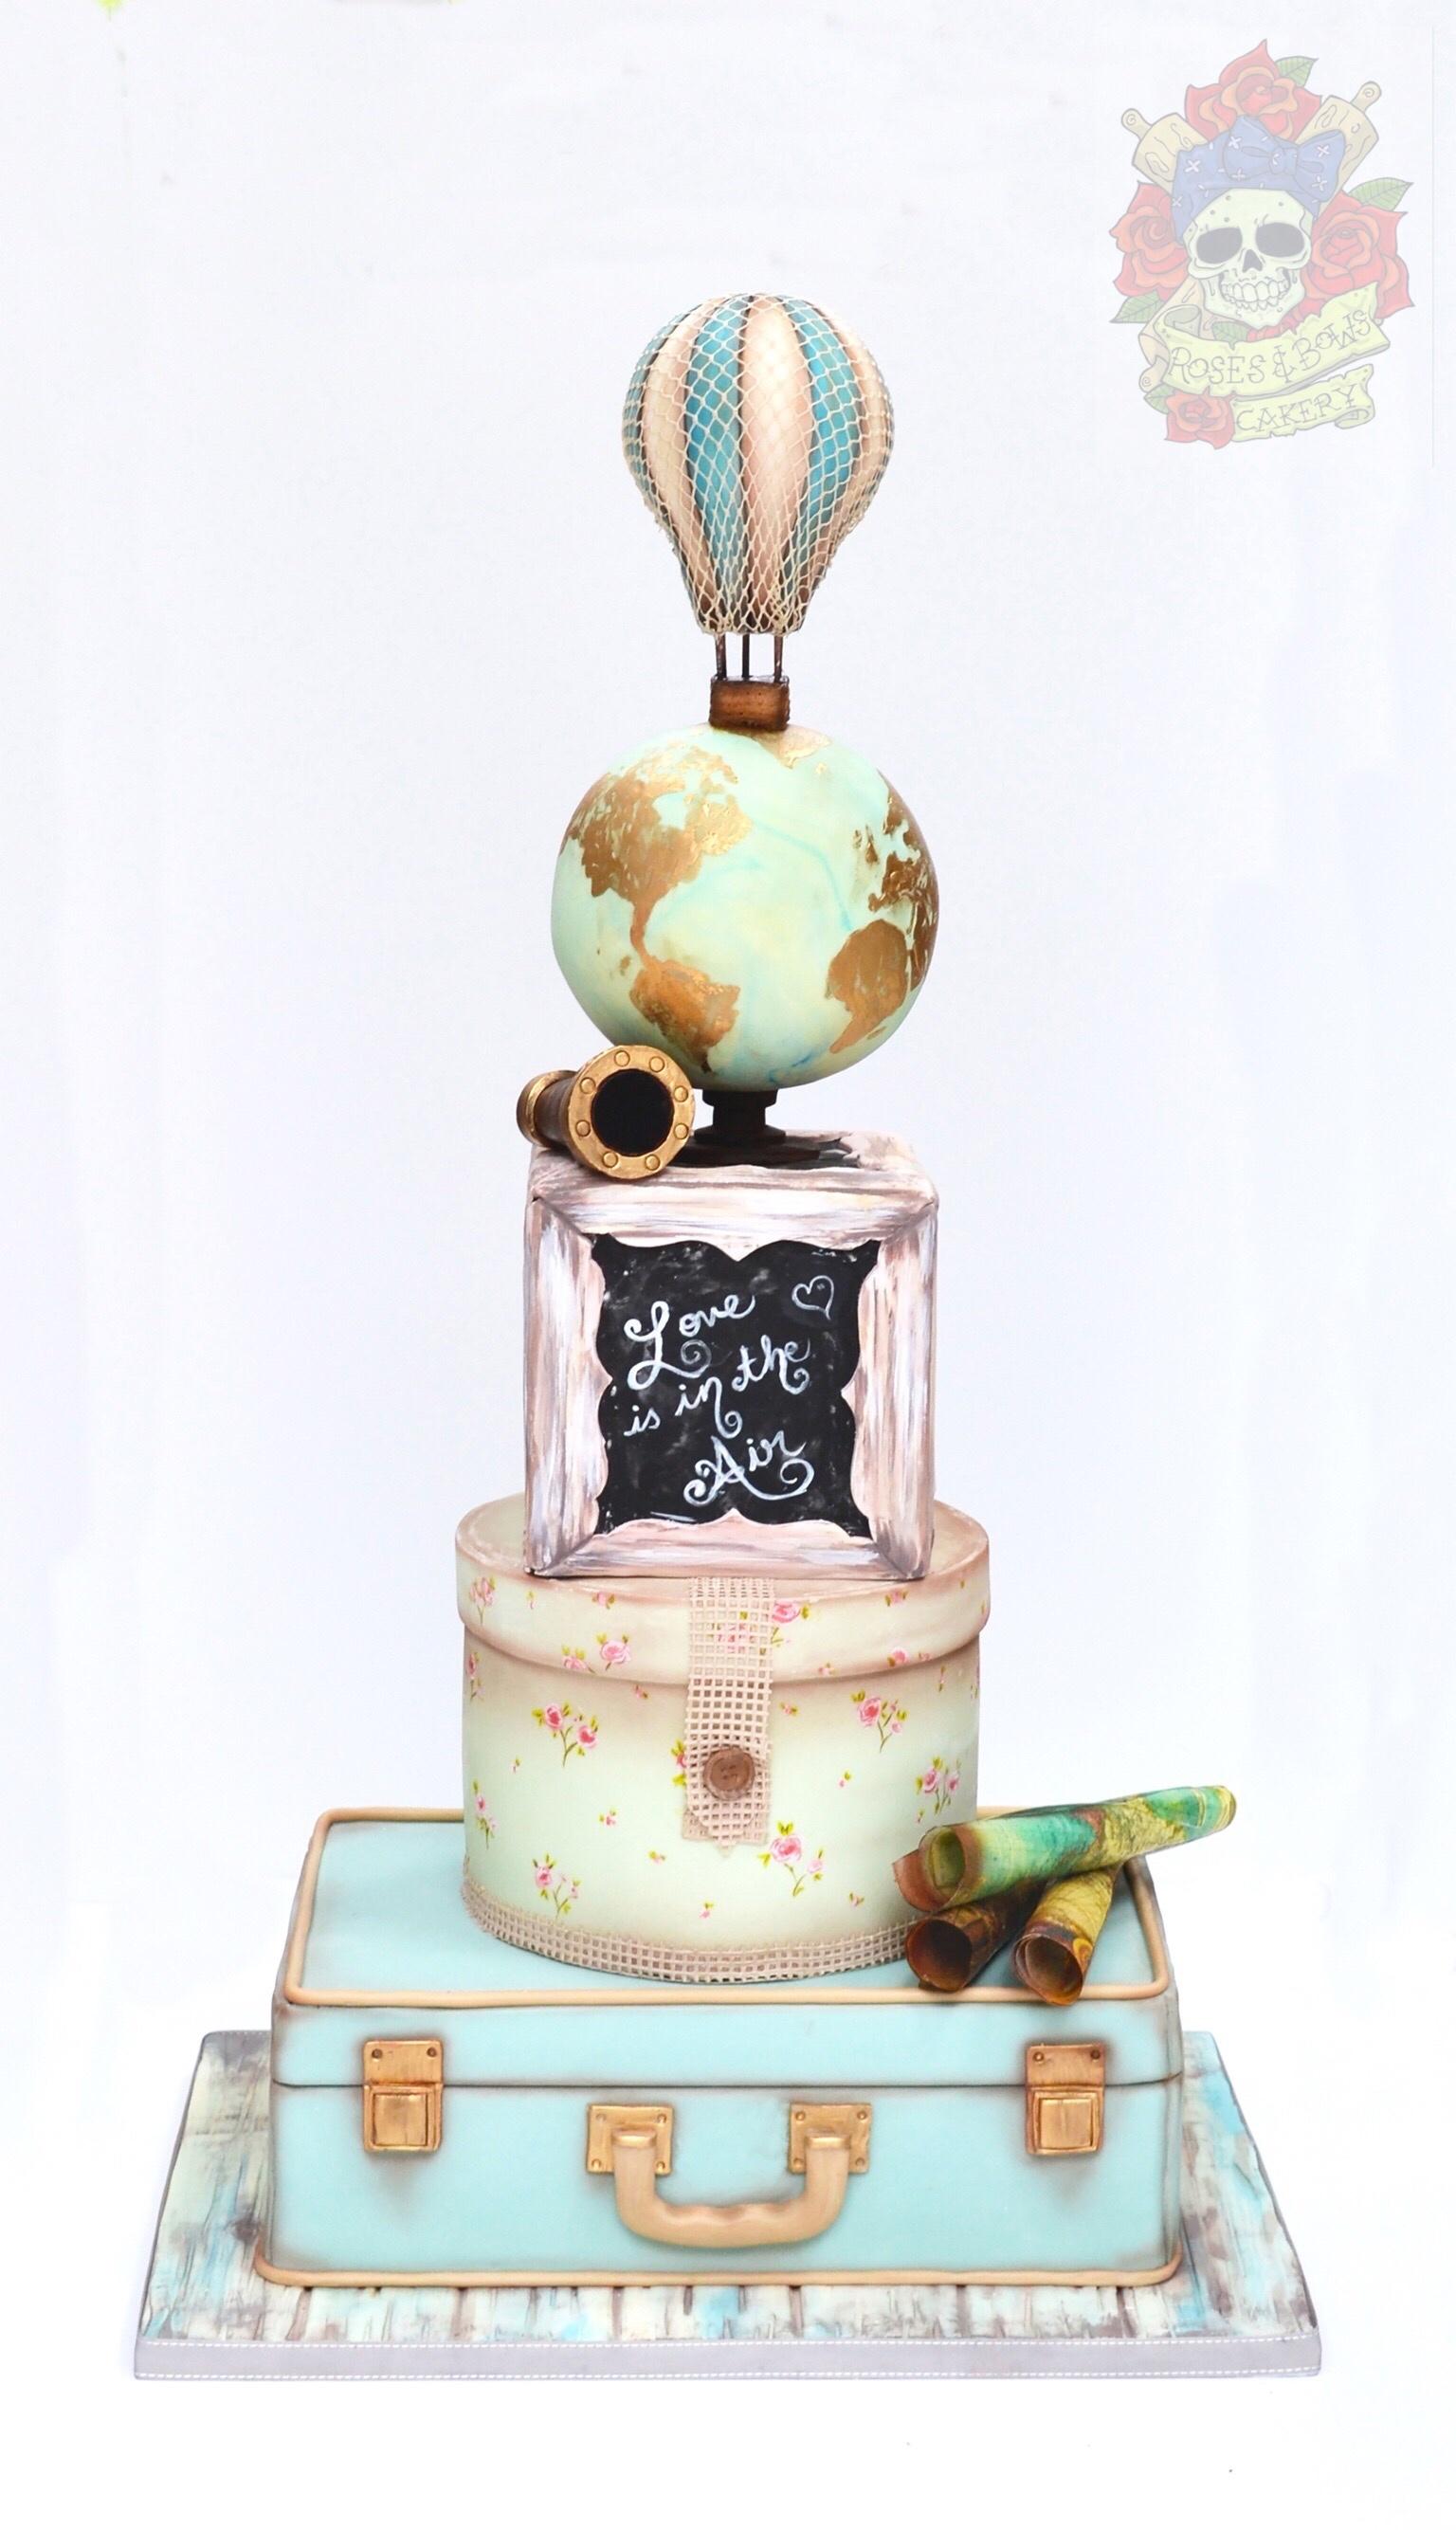 Around the world traveling wedding cake